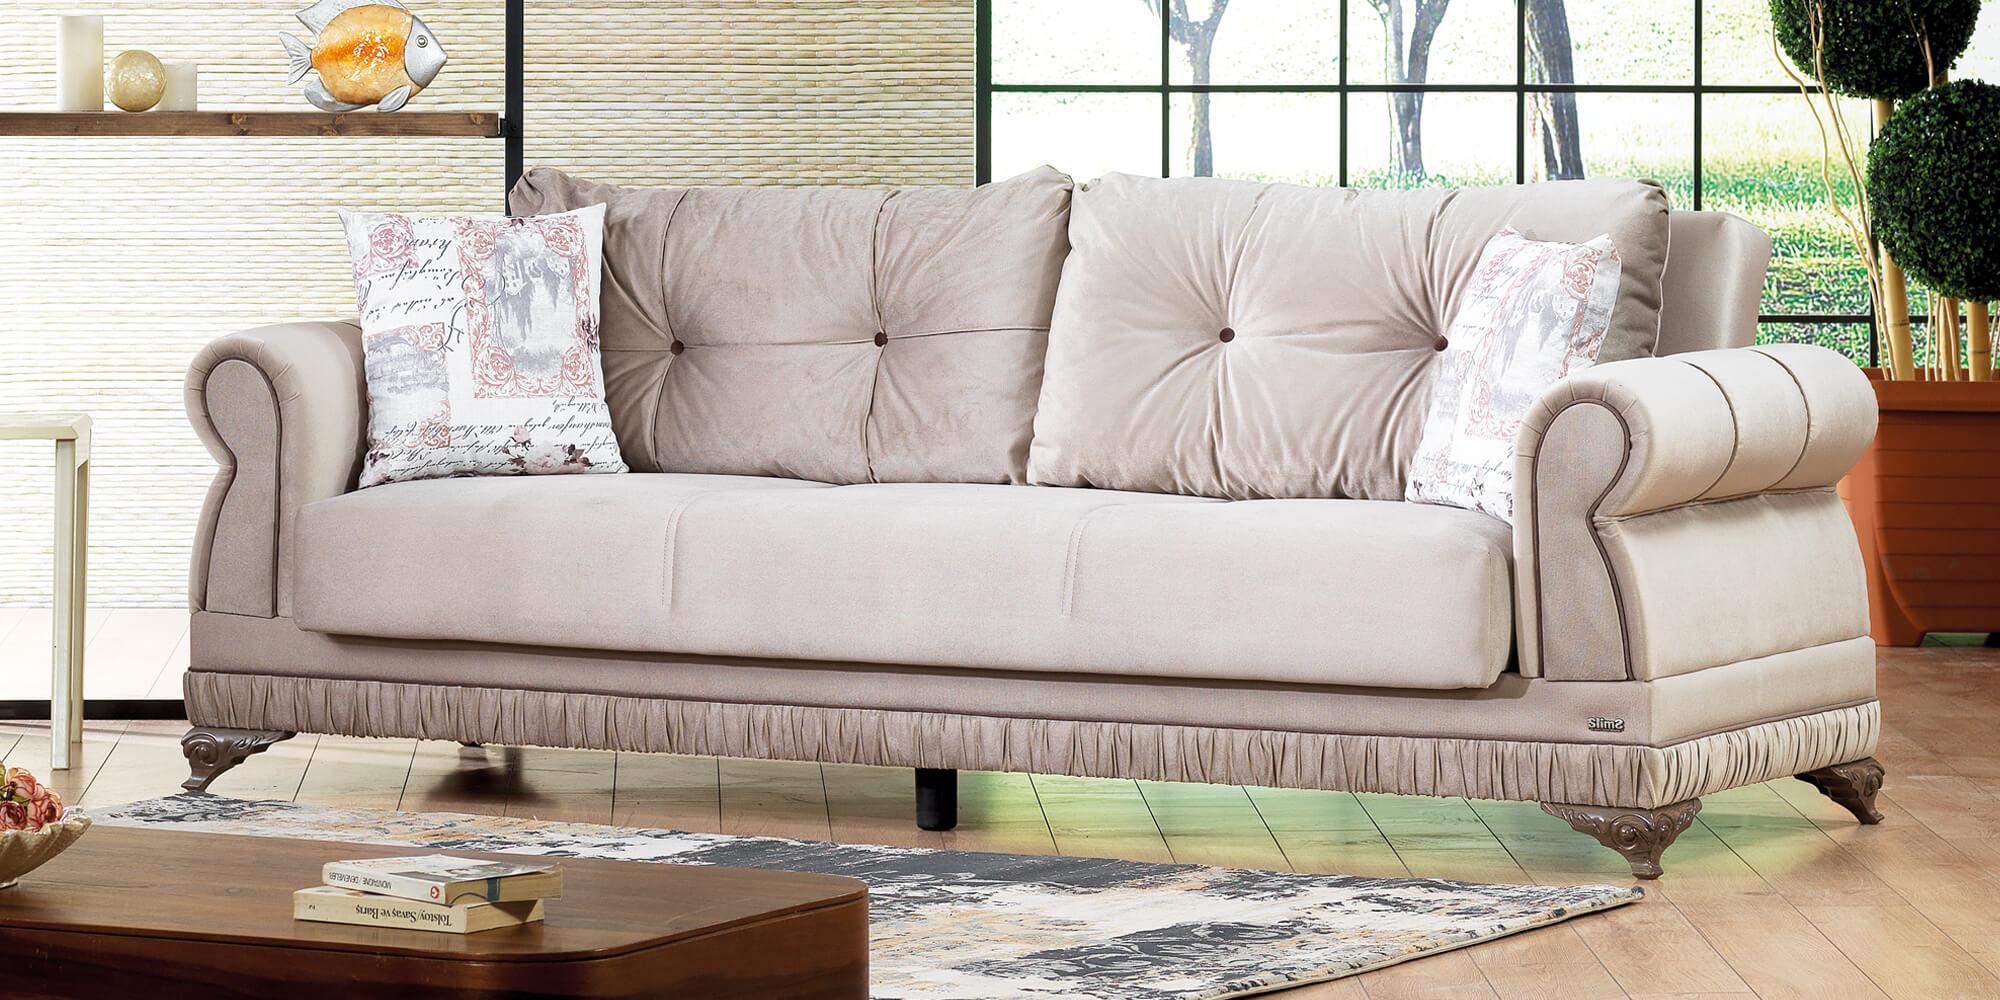 rossa 3 2 1 delux sofa set yuvam m belhaus in wuppertal cilek offizieller h ndler in europa. Black Bedroom Furniture Sets. Home Design Ideas